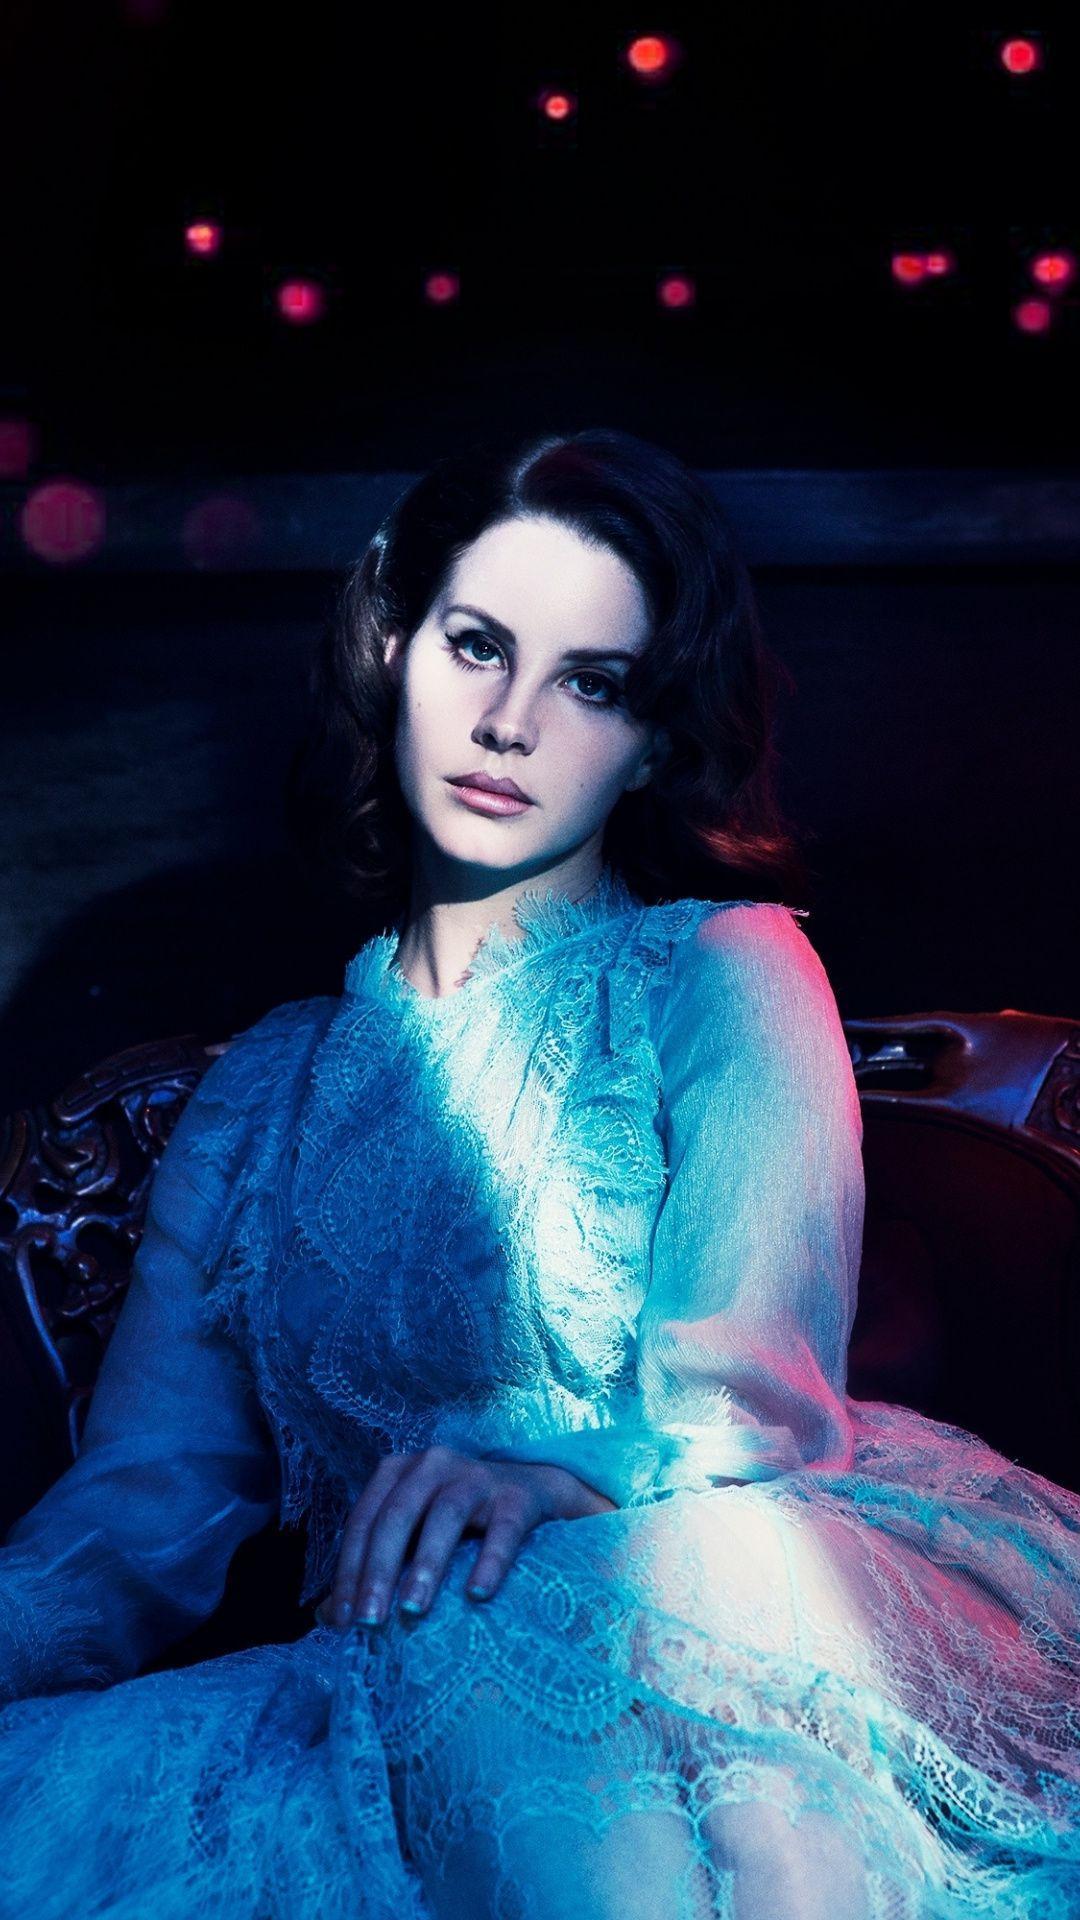 Lana Del Rey Doin Time Wallpapers - Wallpaper Cave